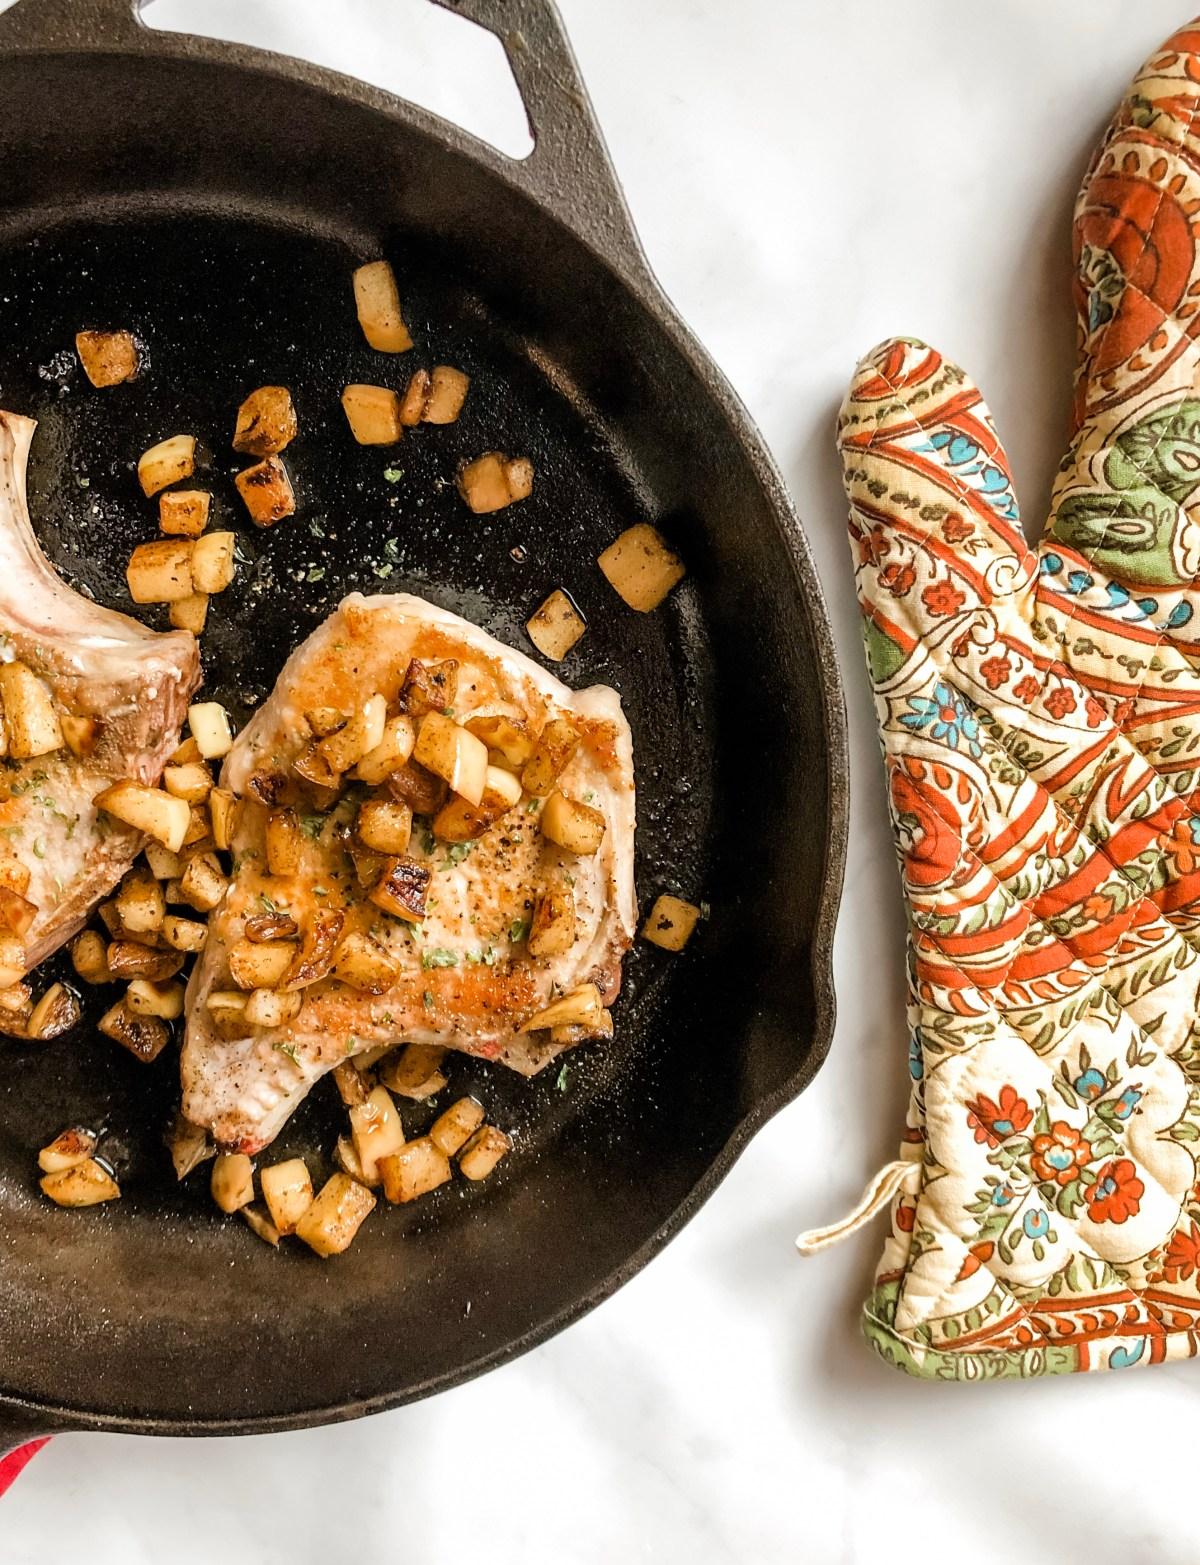 Skillet Pork Chops with Cinnamon Apples